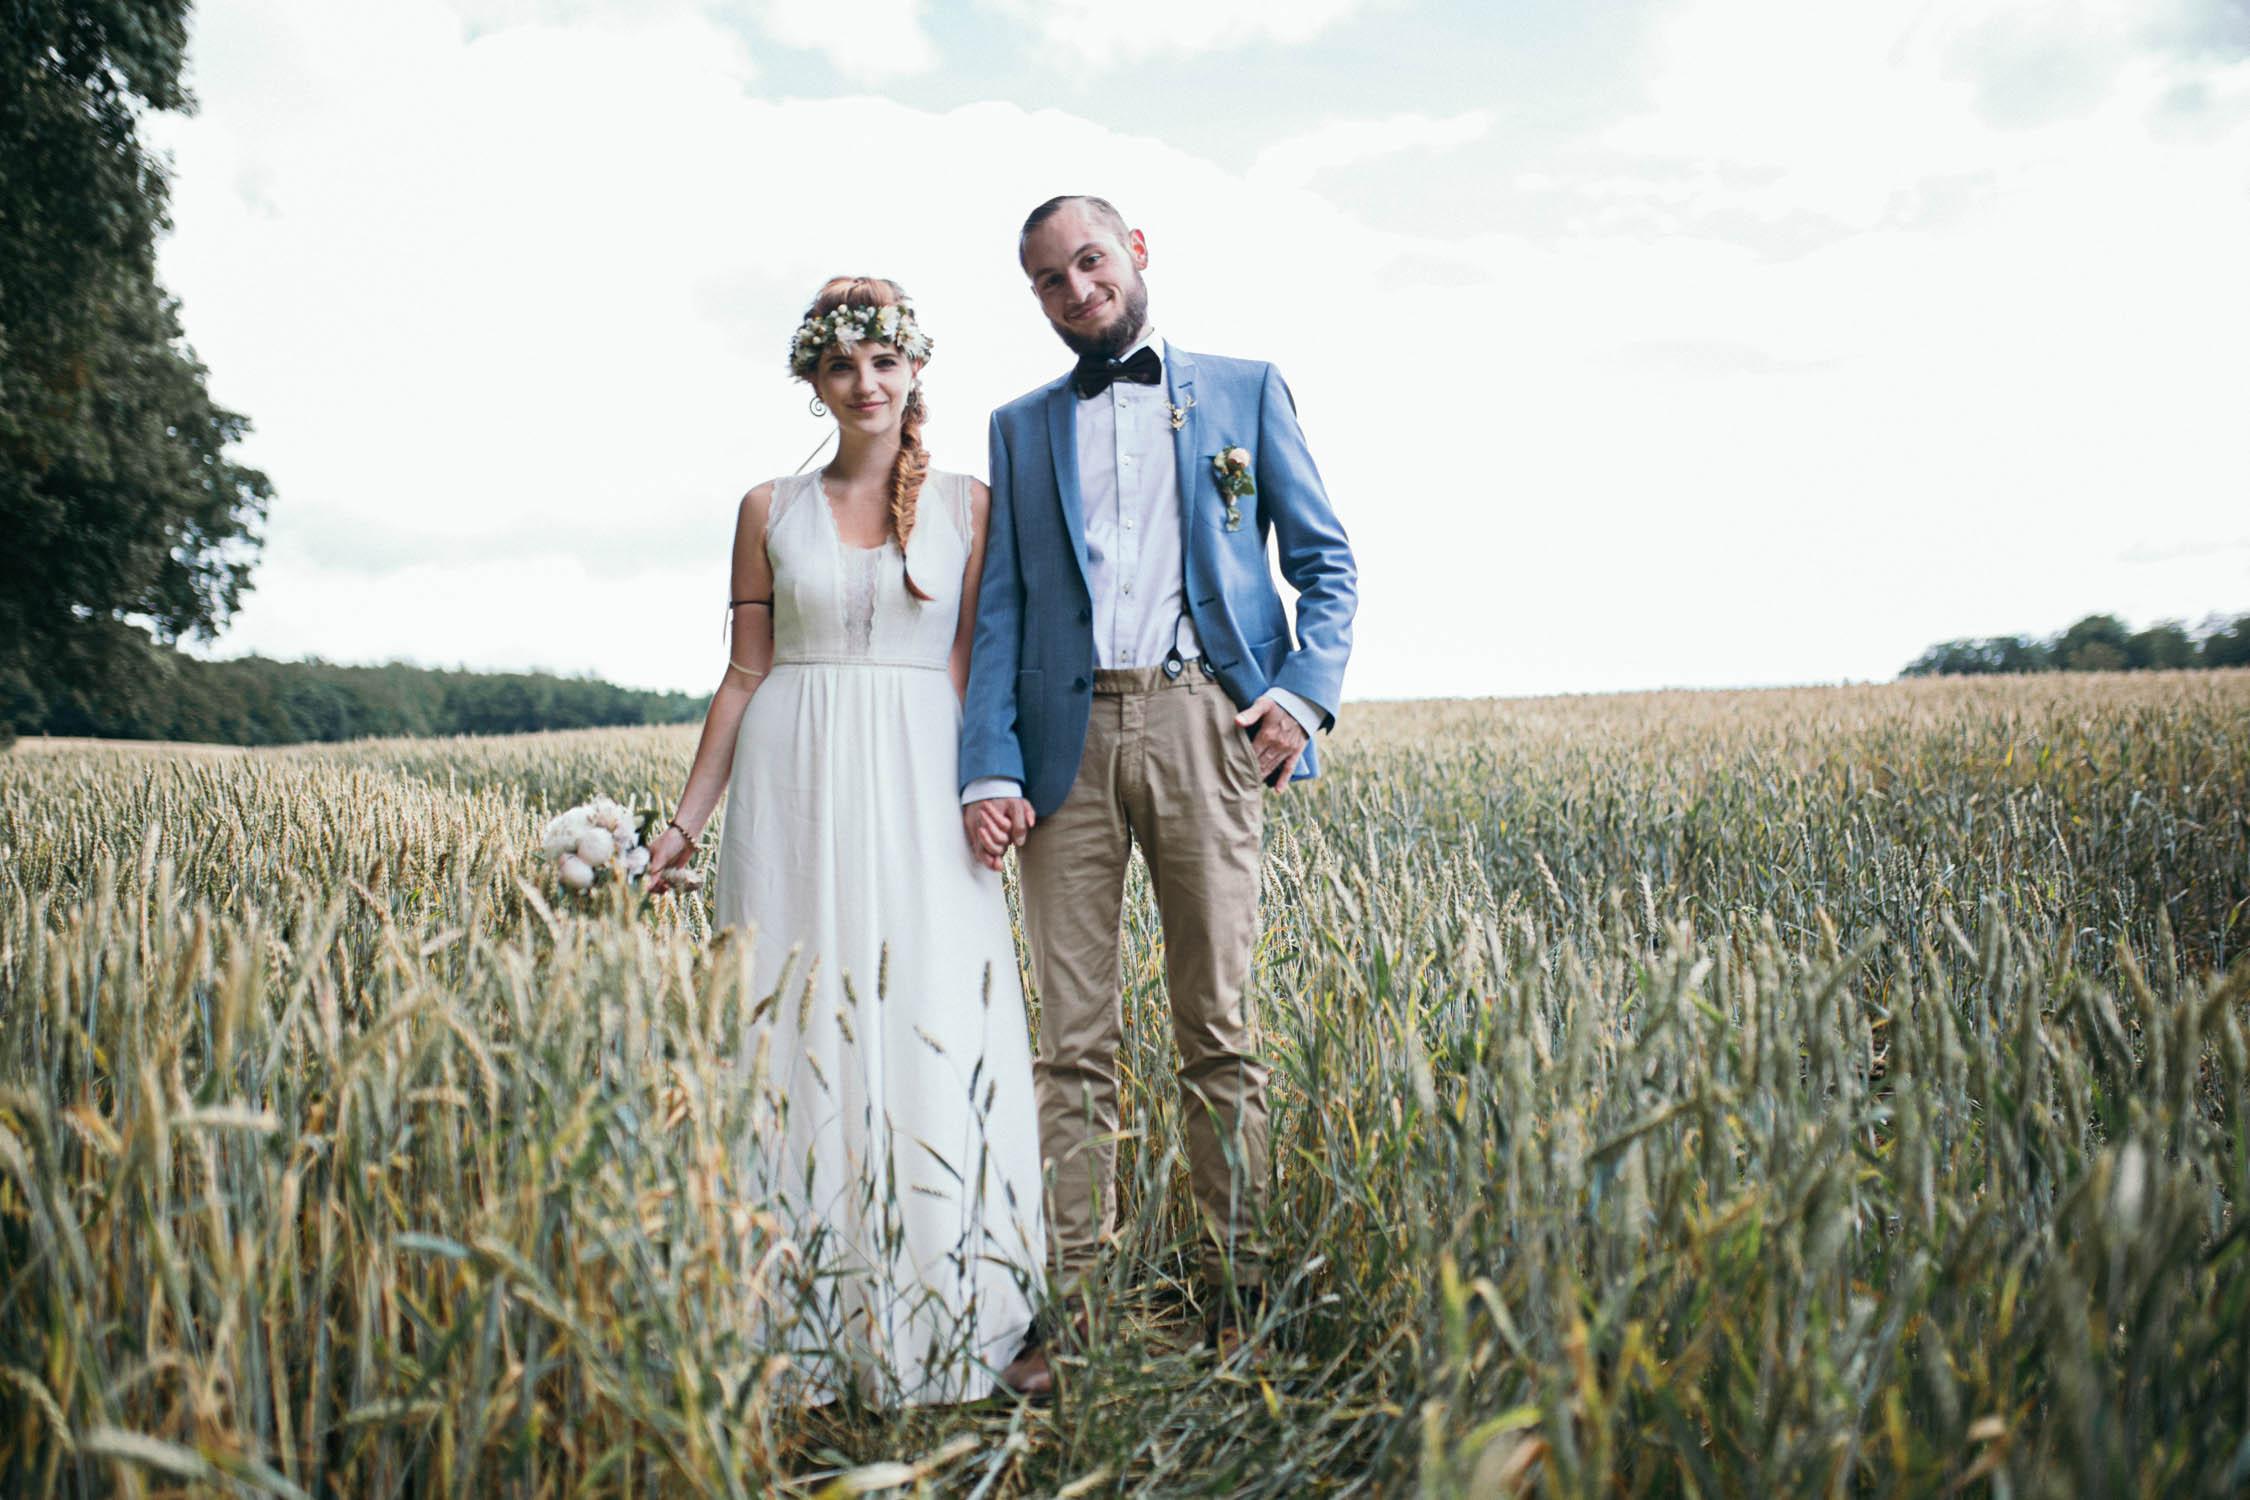 Brautpaar-im-kornfeld-blumenkranz-flowercrown